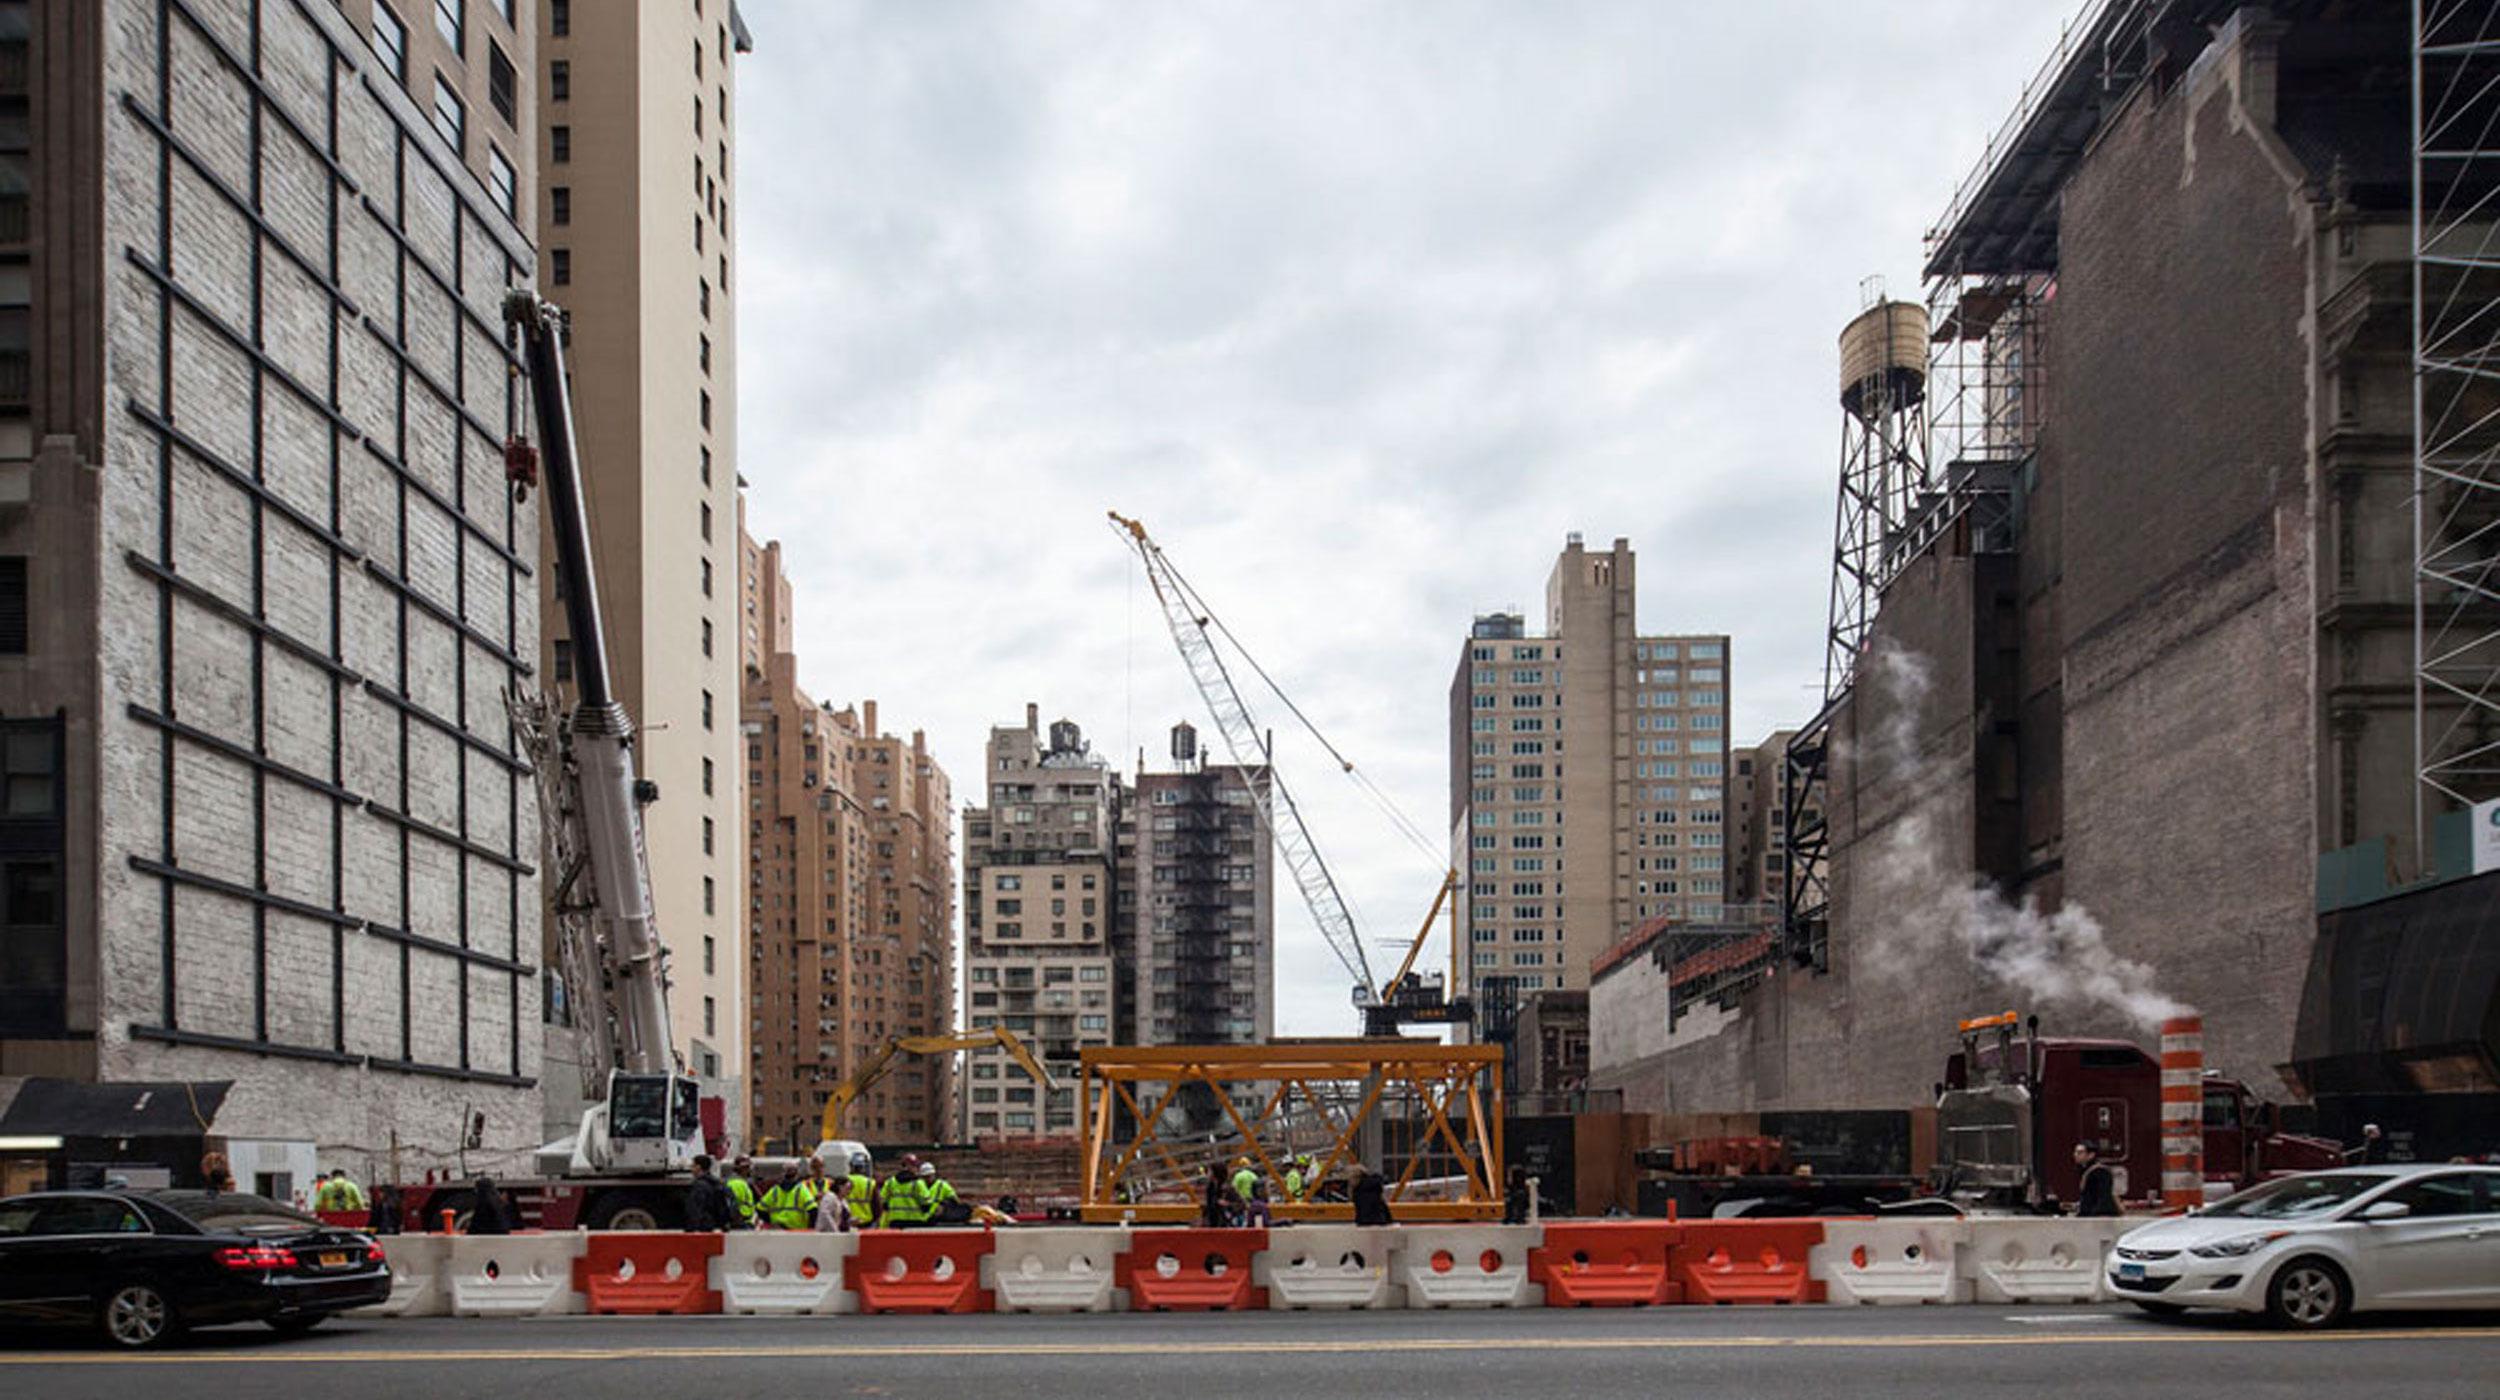 Montse Zamorano, Deconstructing New York City